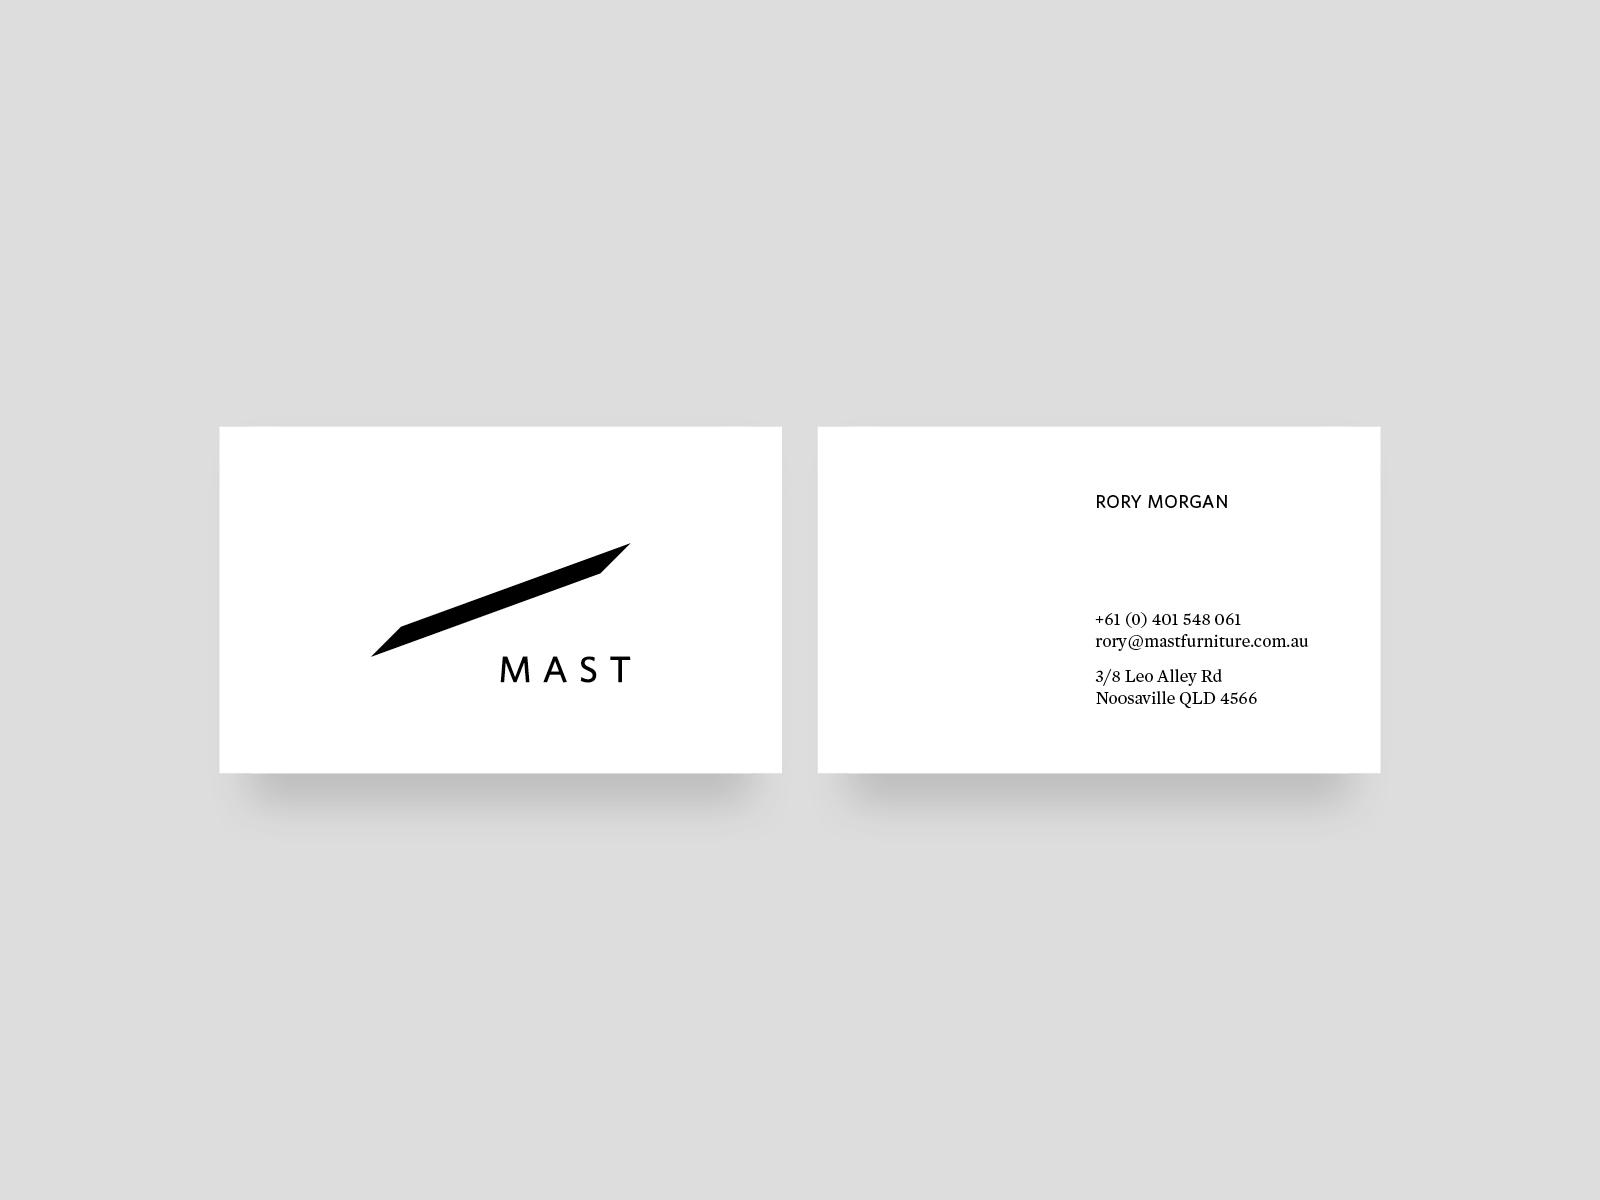 mast-furniture-6.jpg